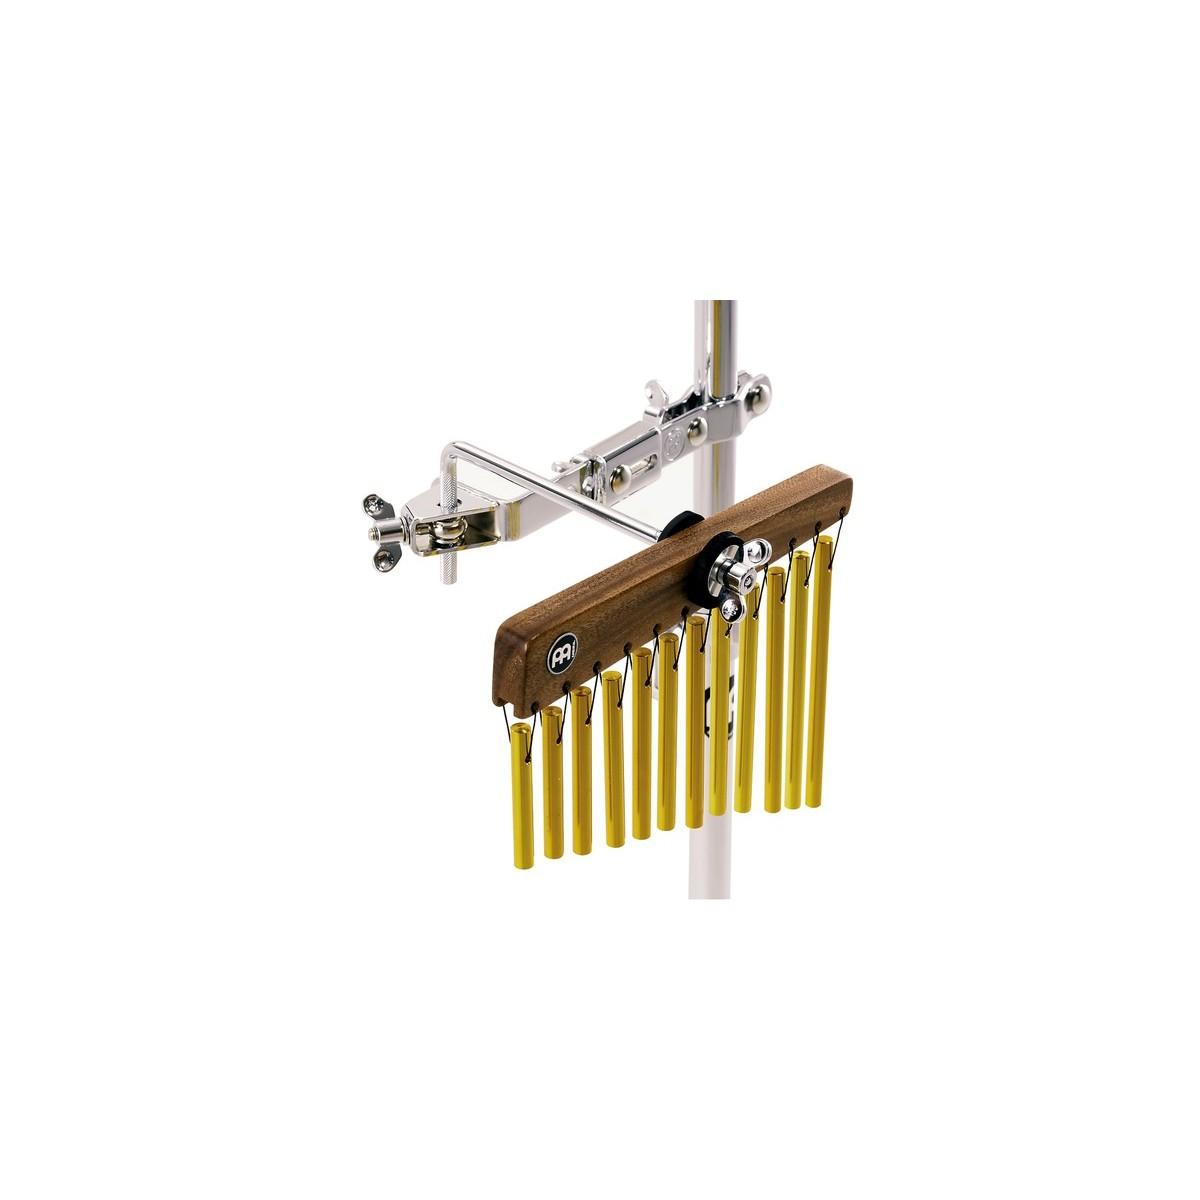 Meinl carillon de porte australian treasures - Carillon de porte ...